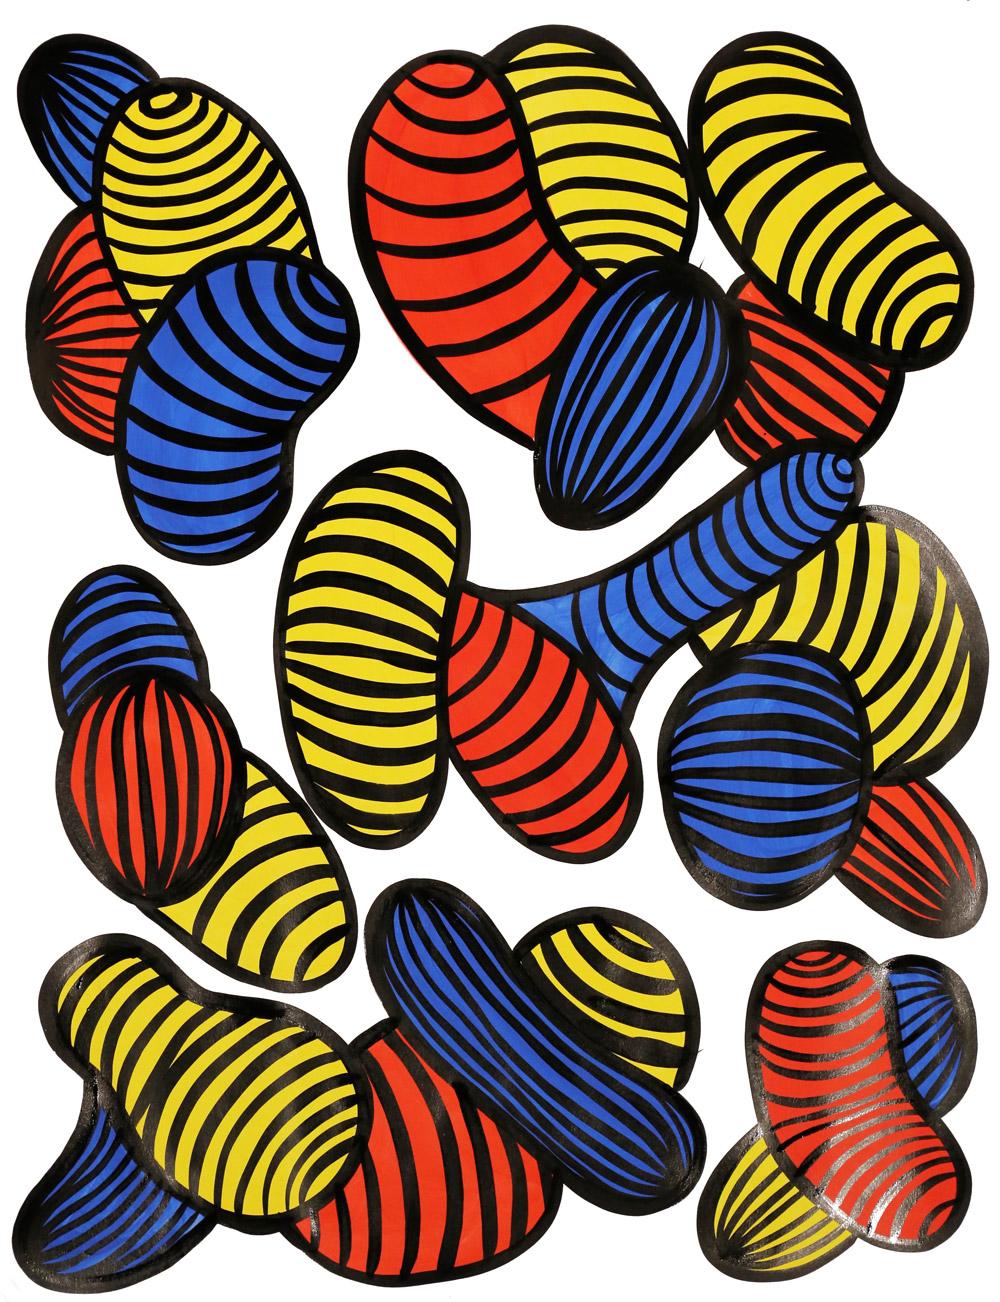 Red-yellow-blue-2-W.jpg